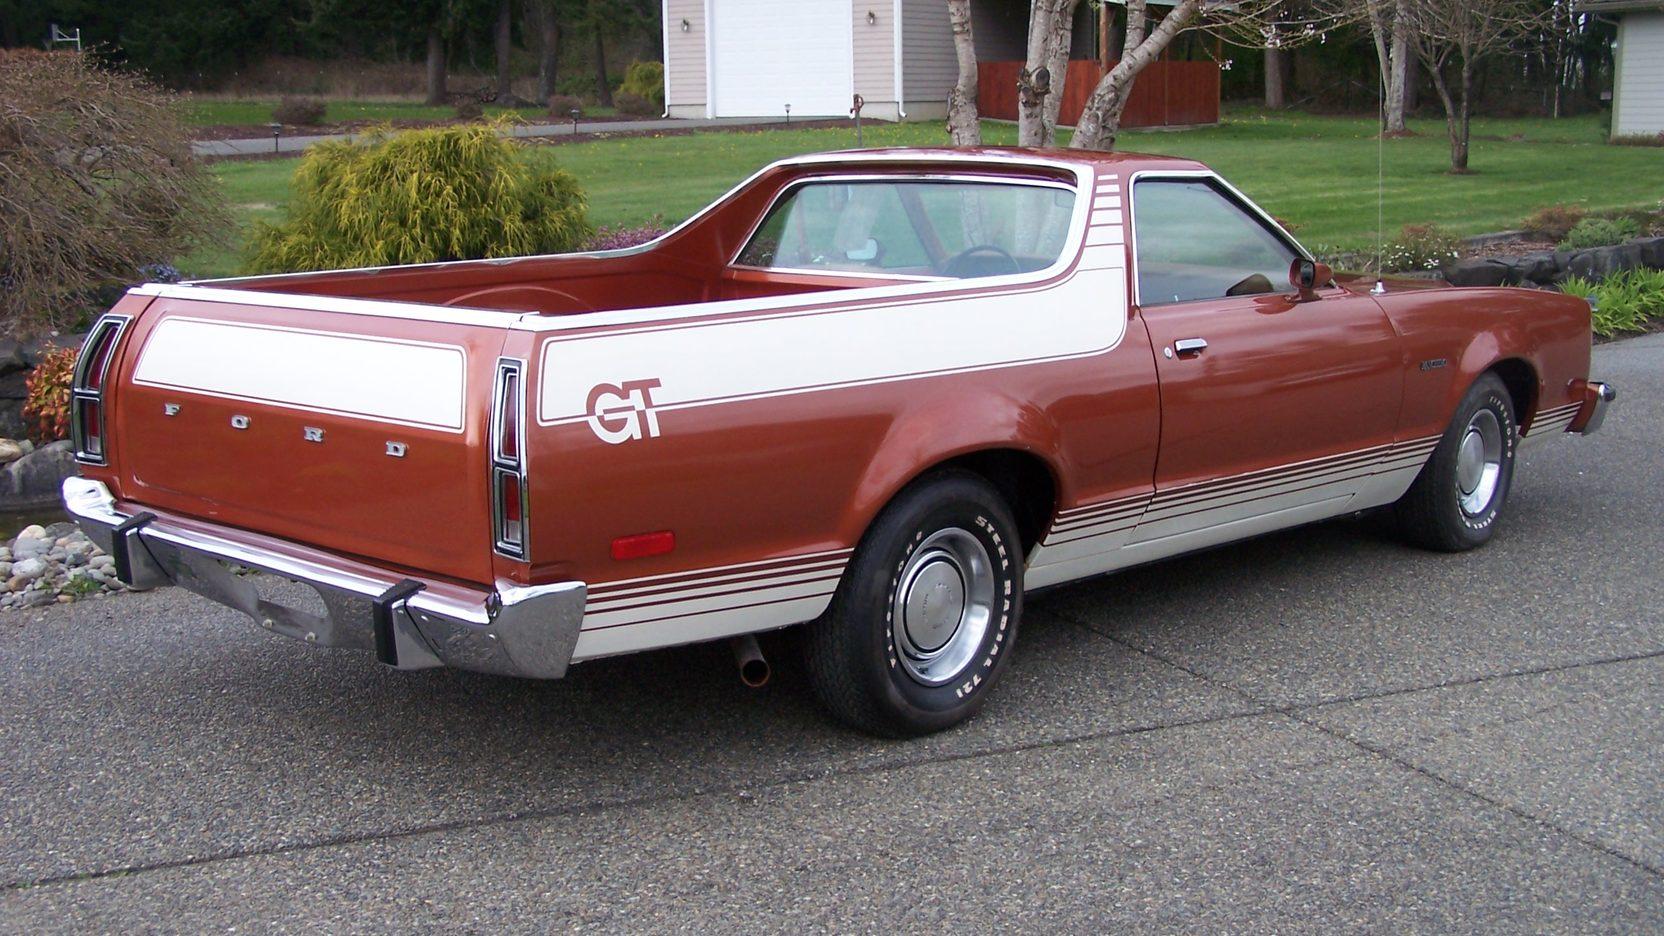 1979 Ford Ranchero GT